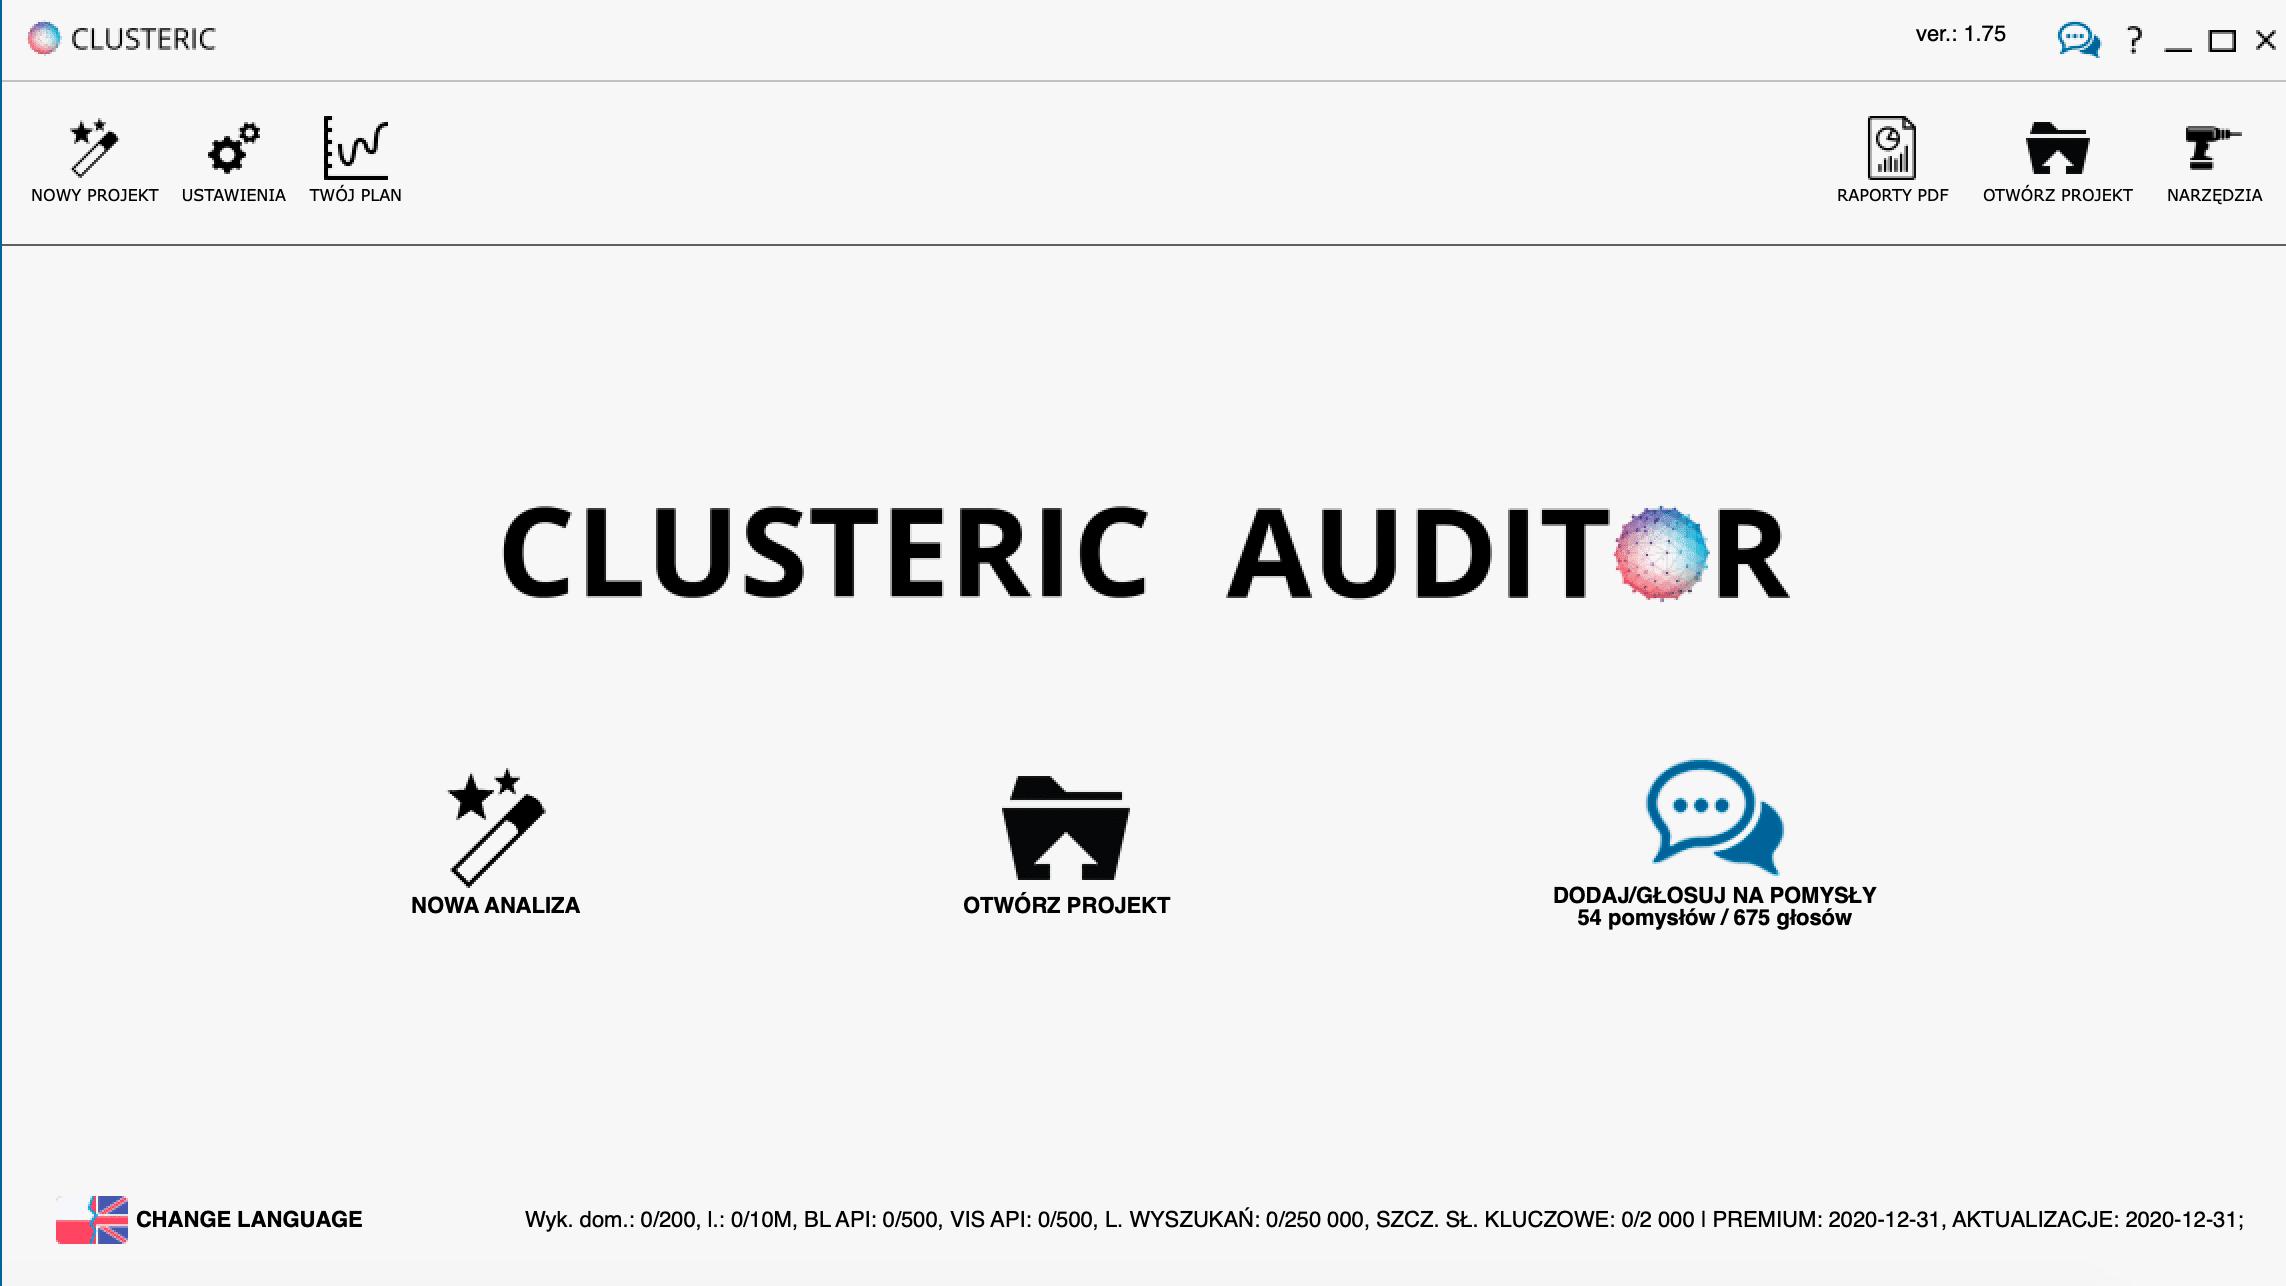 clusteric